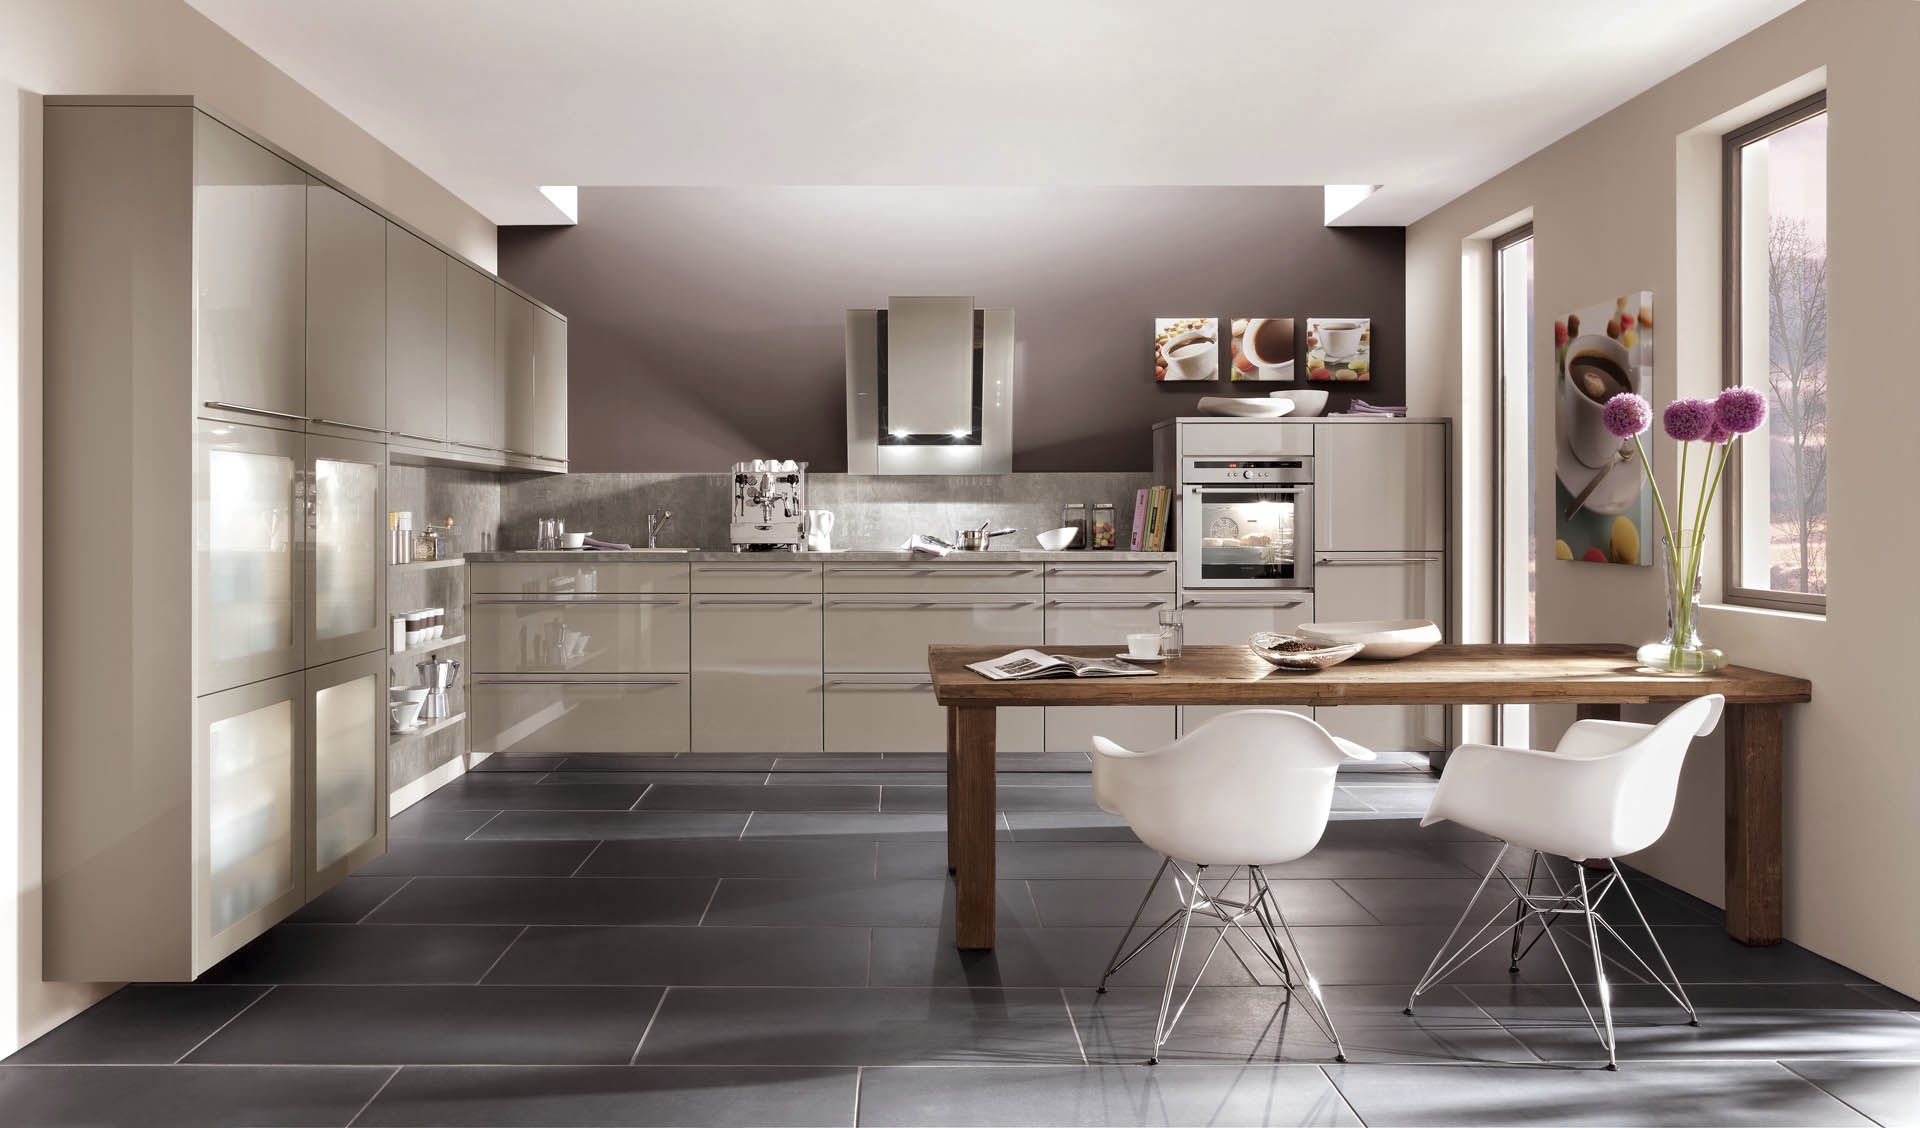 Moderne Küche / Holz / lackiert / Hochglanz - NOVA 854 - nobilia